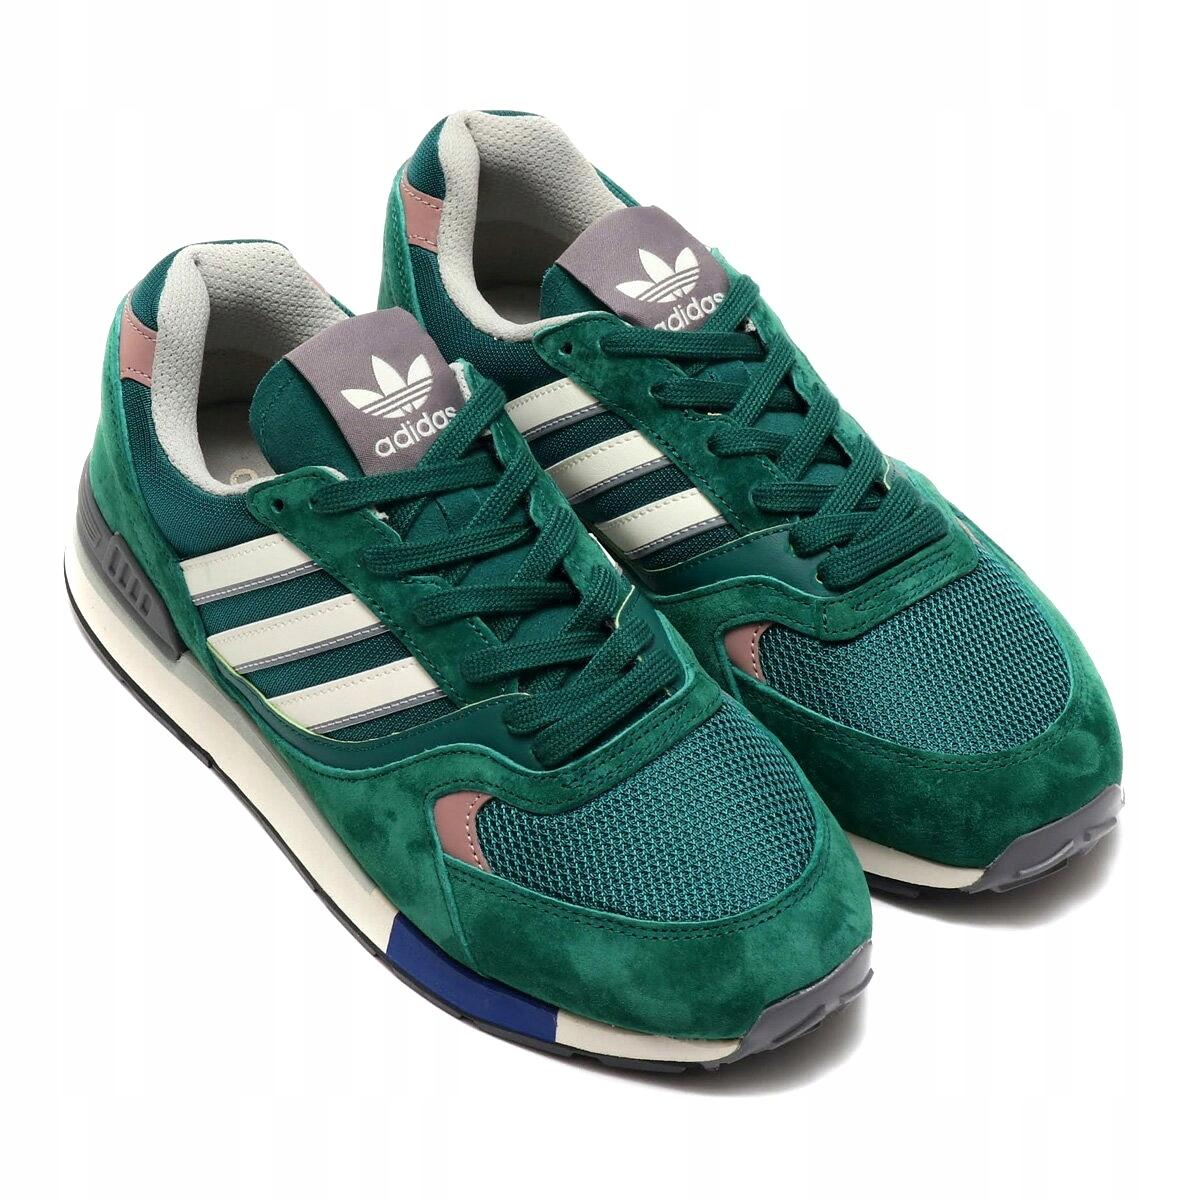 6231192fb0456 Buty Adidas Quesence Originals Zielone Sneakers 45 - 7584340454 ...